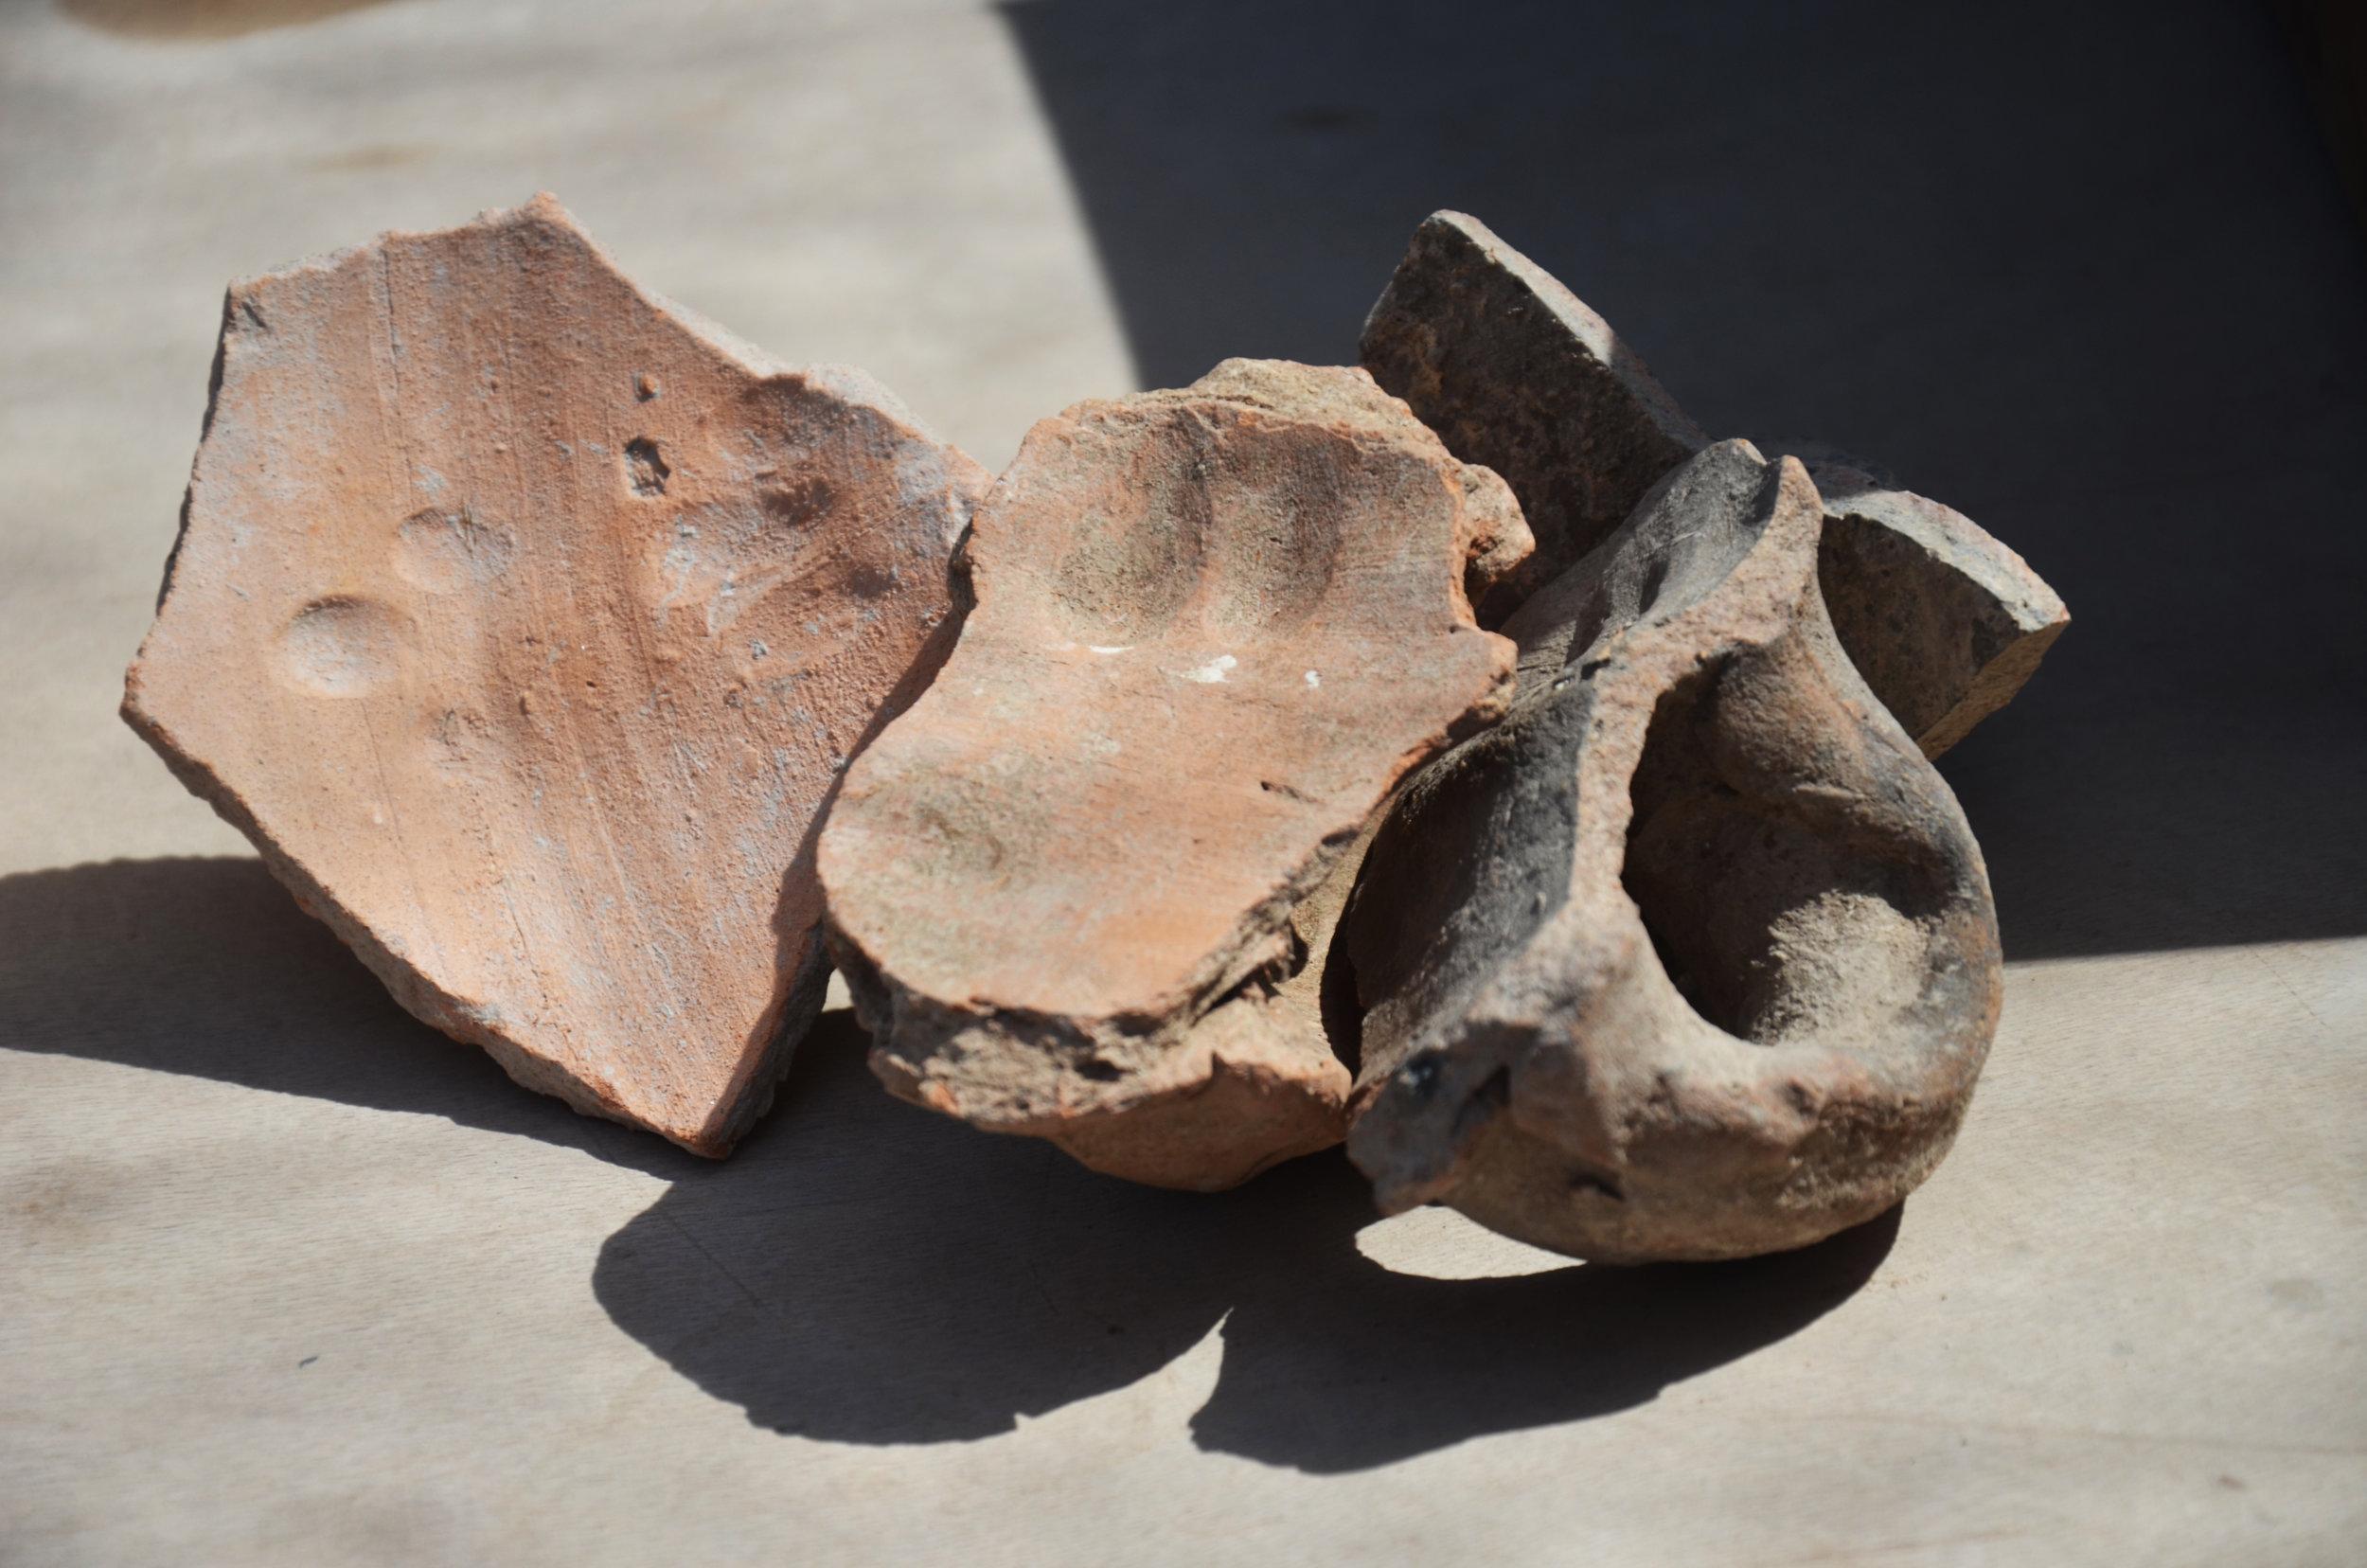 The potter's fingerprints on 1500-year old storage jar handles. Photo: Yoli Schwartz, IAA